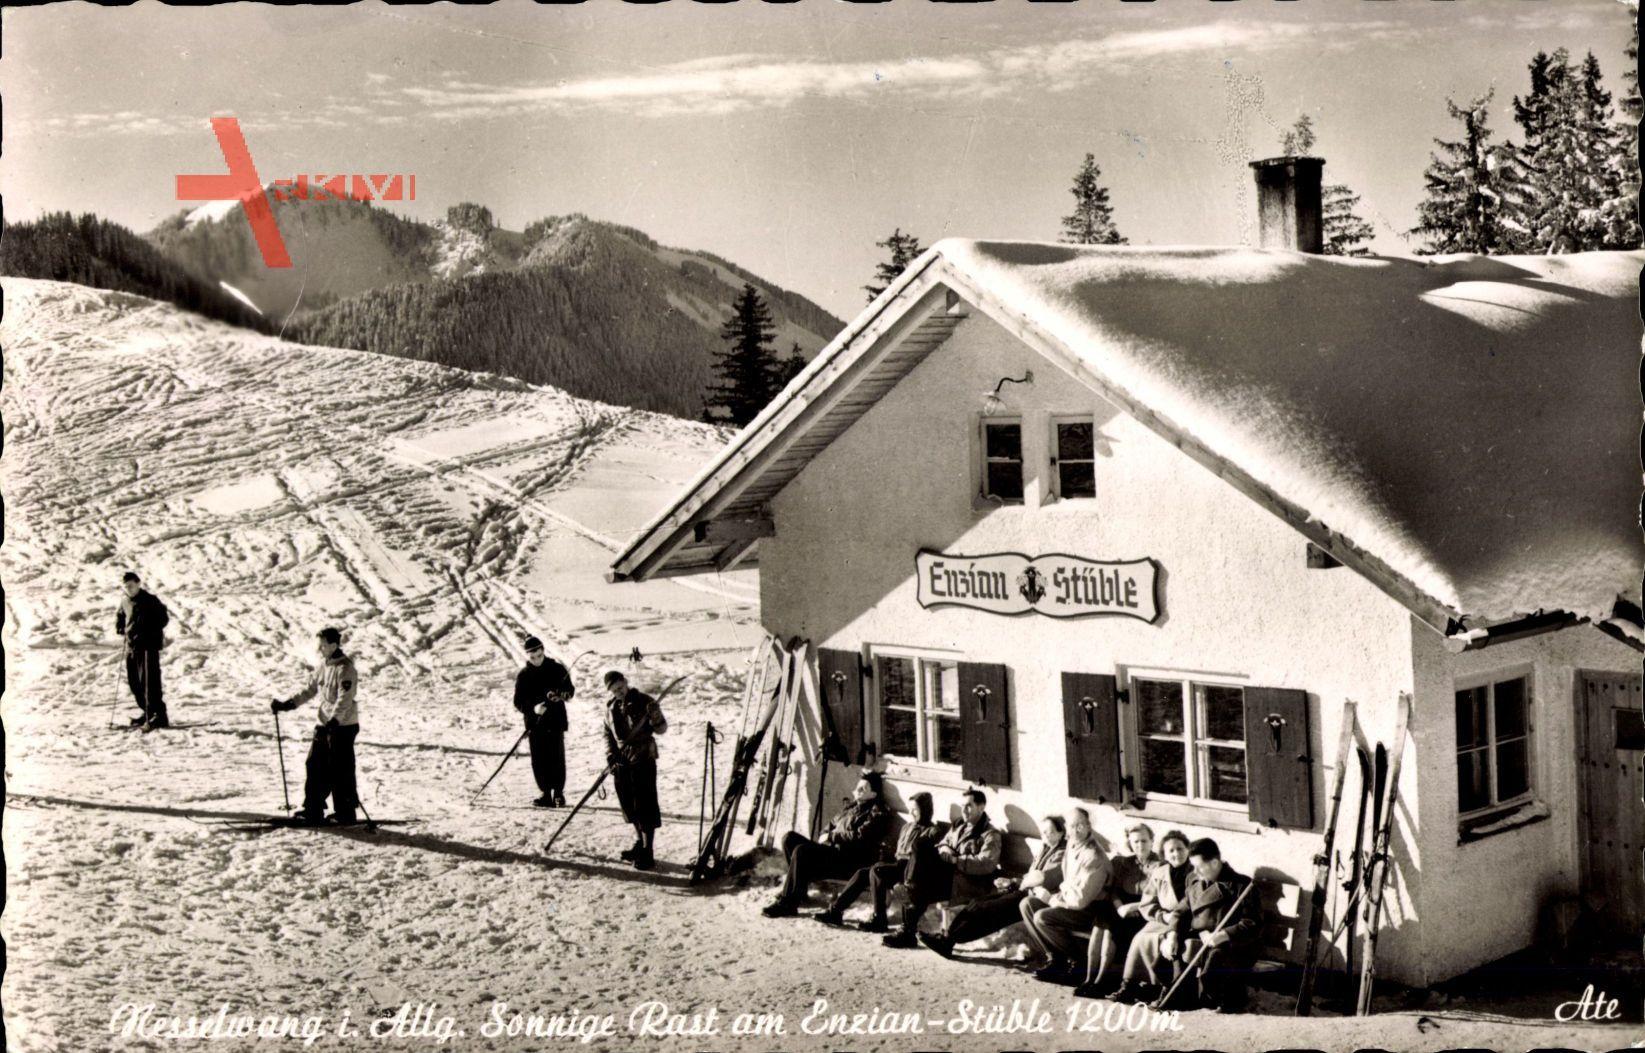 Nesselwang Allgäu, Sonnige Rast am Enzian Stüble, Winter, Schnee